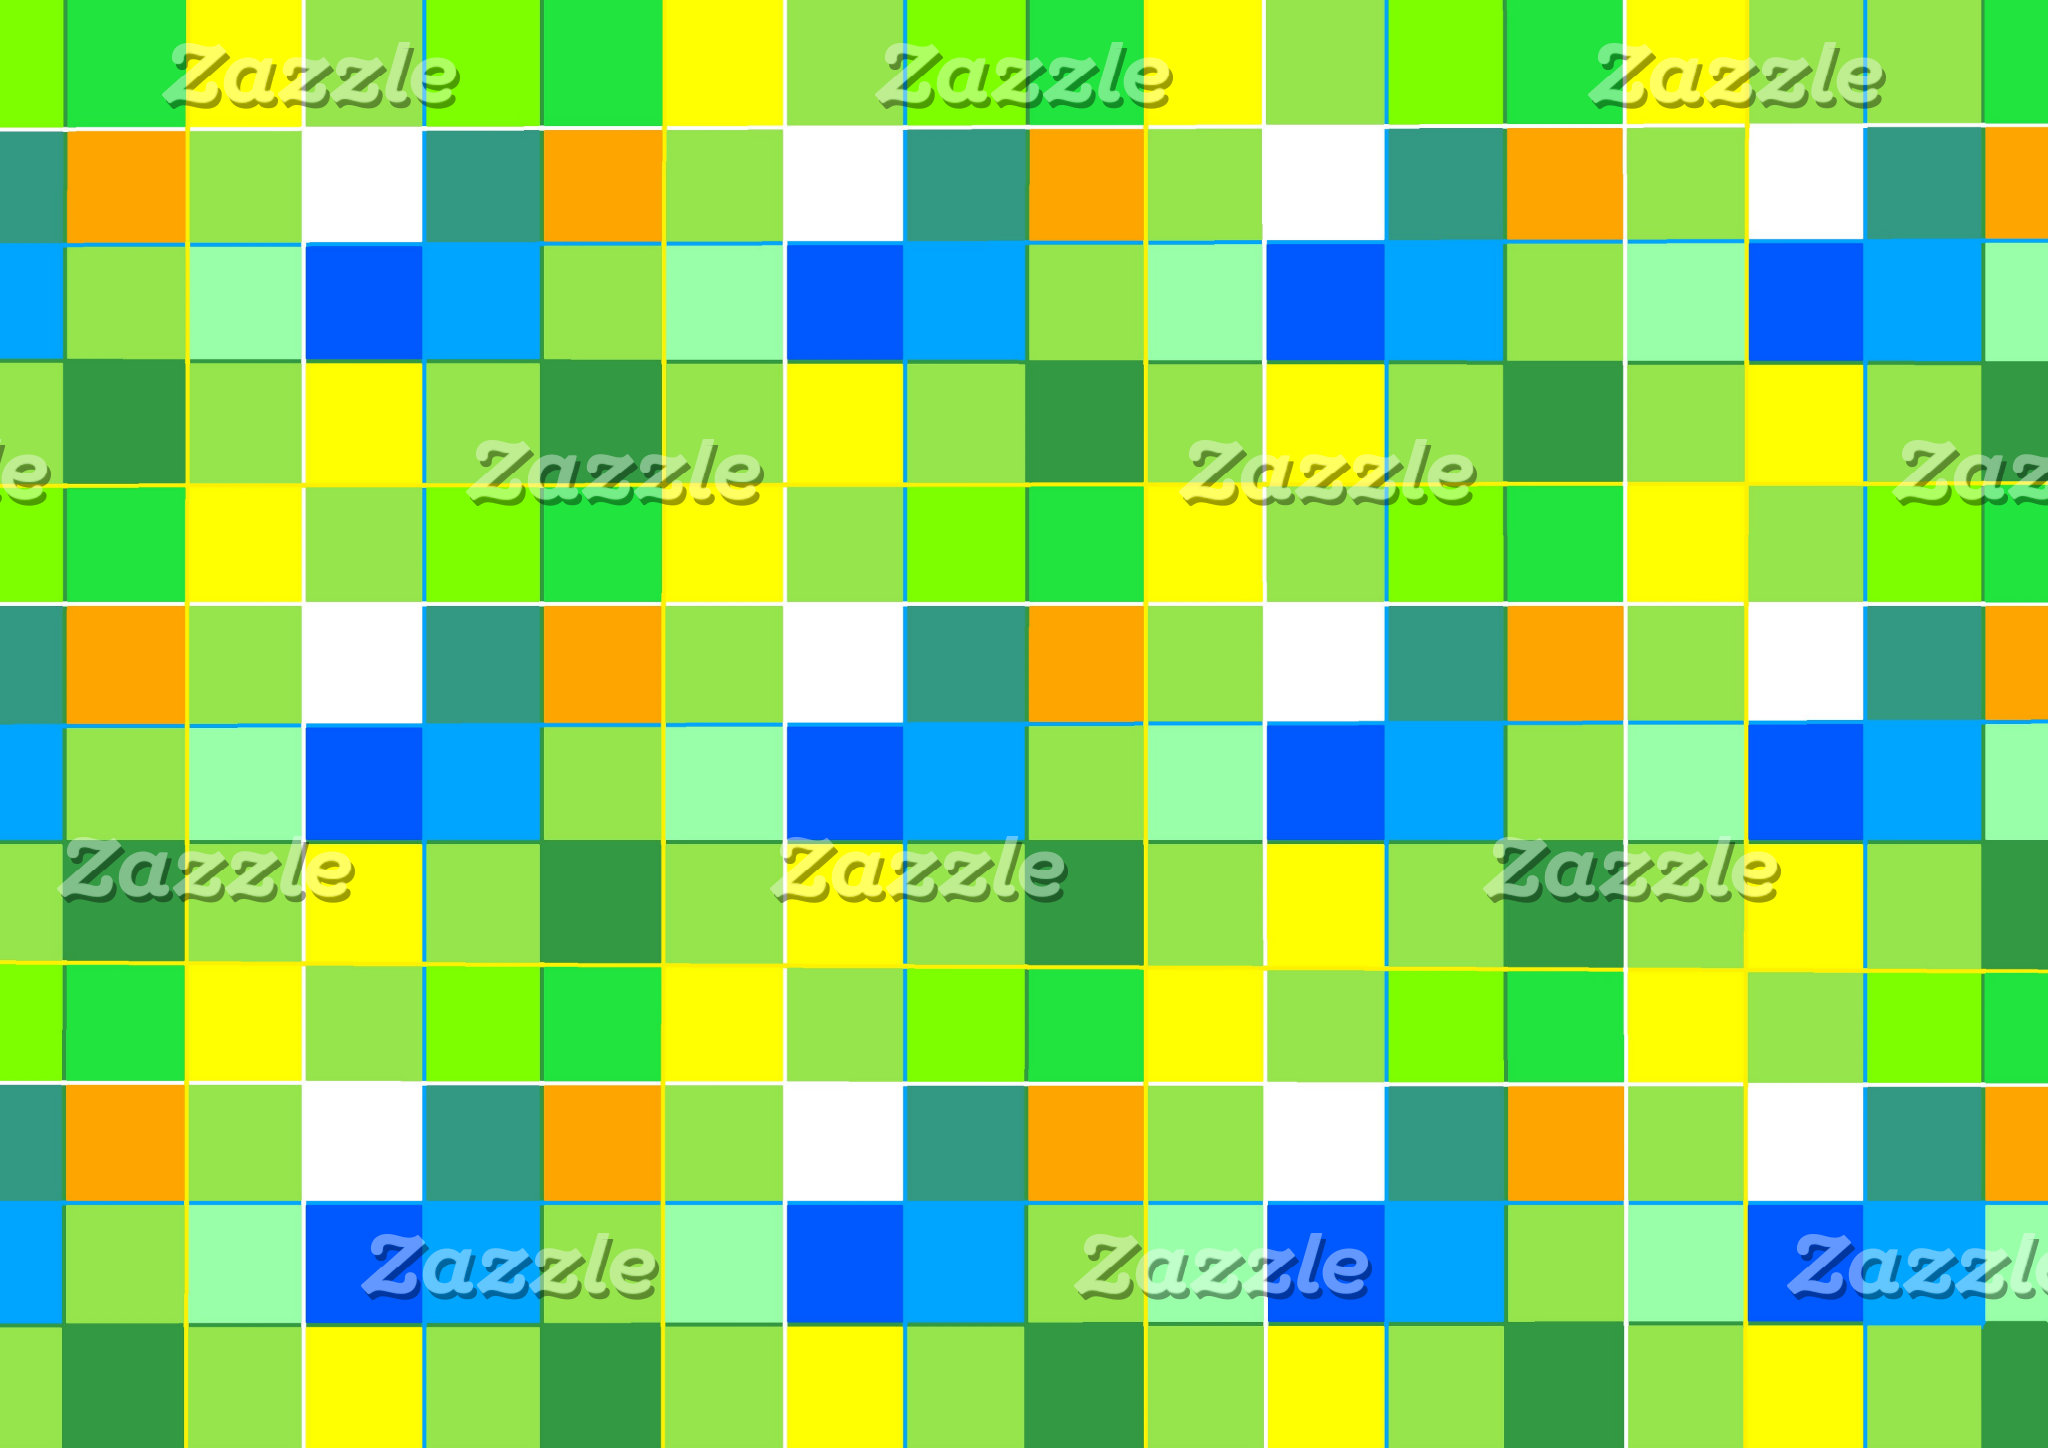 Brazil color